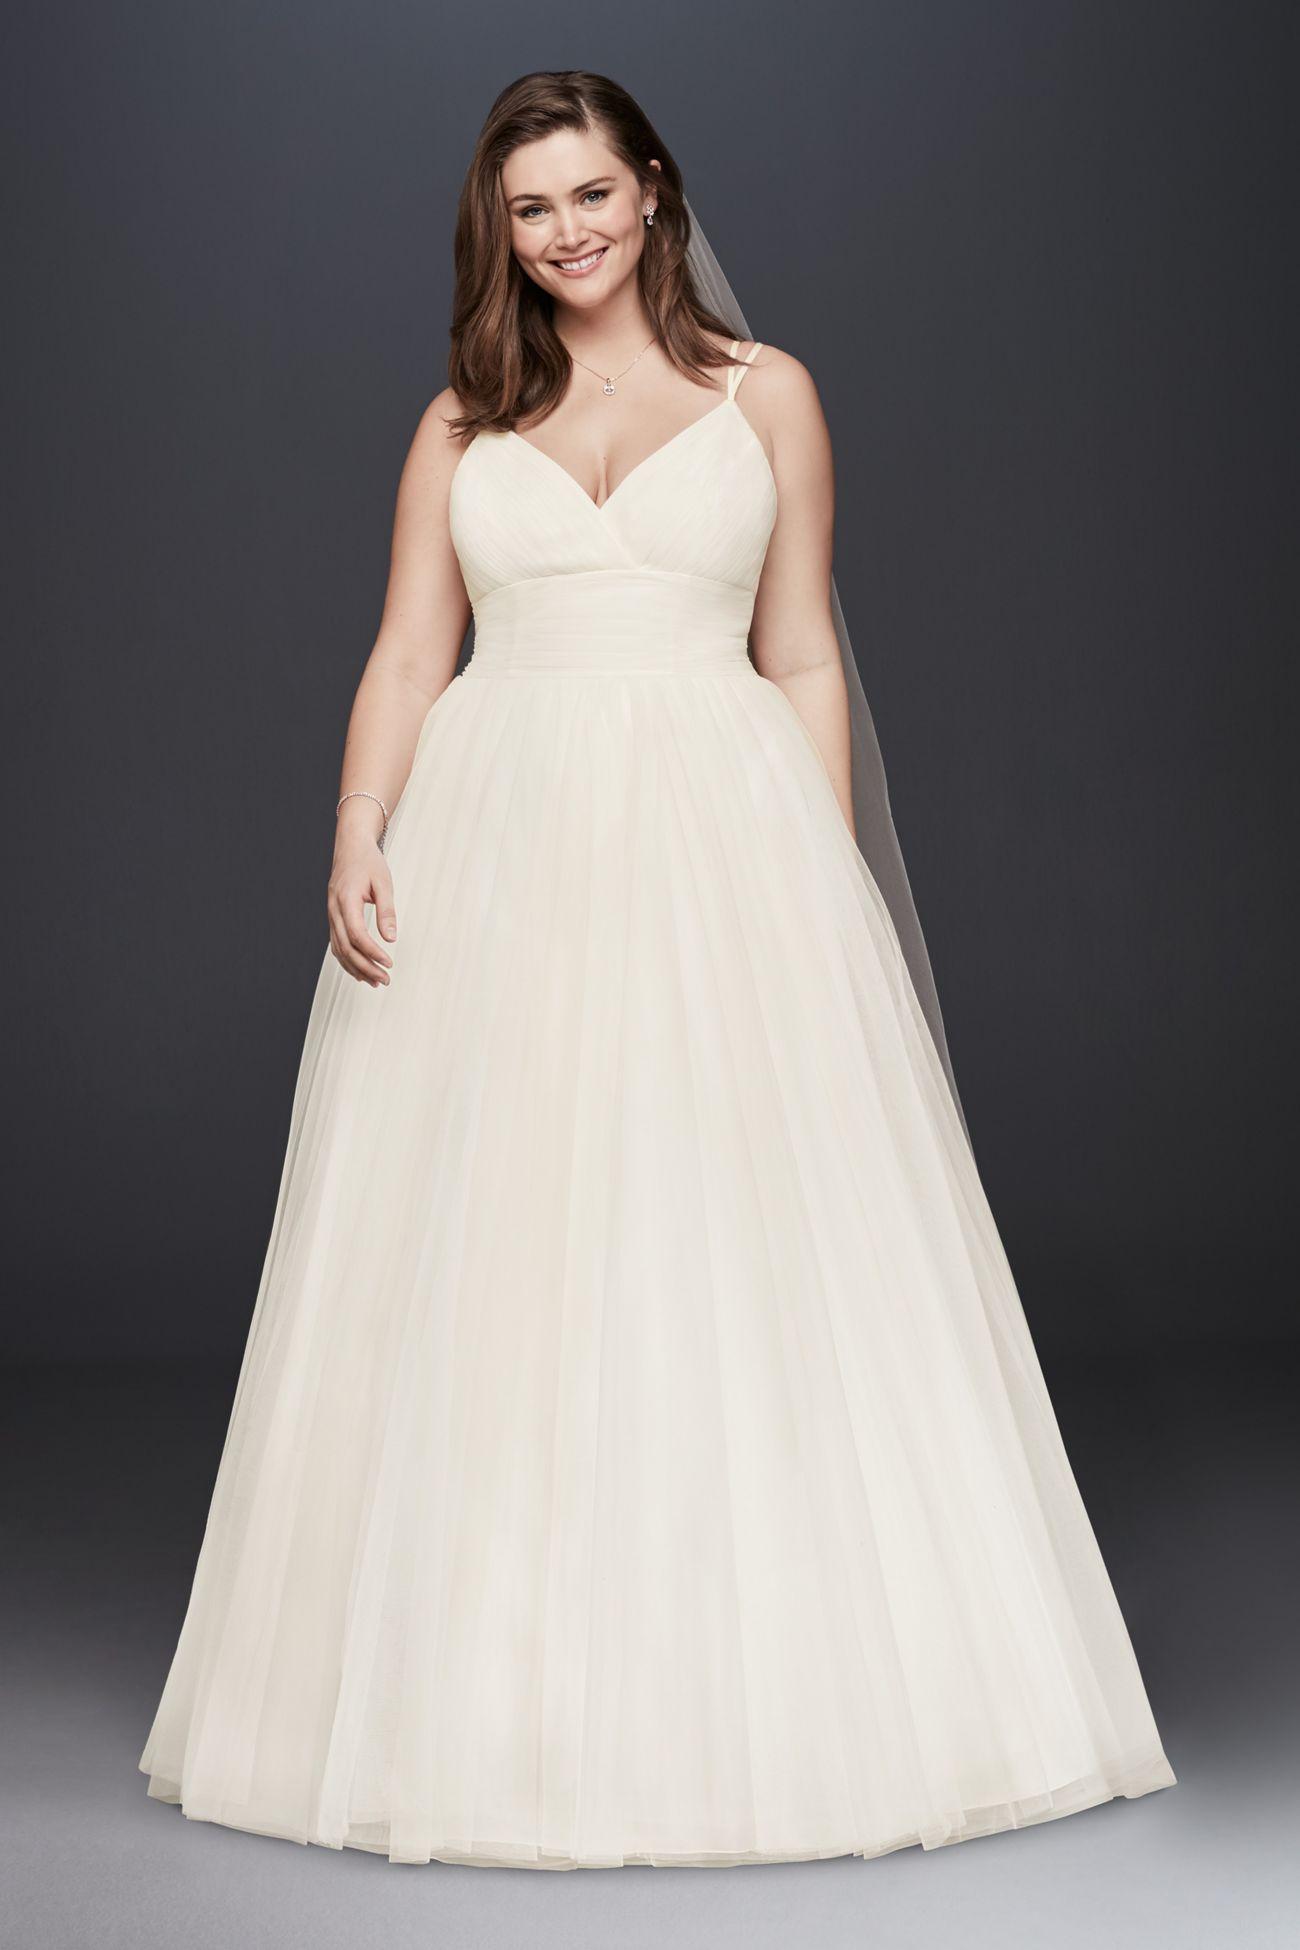 Wg weddings pinterest wedding dress wedding and ball gowns